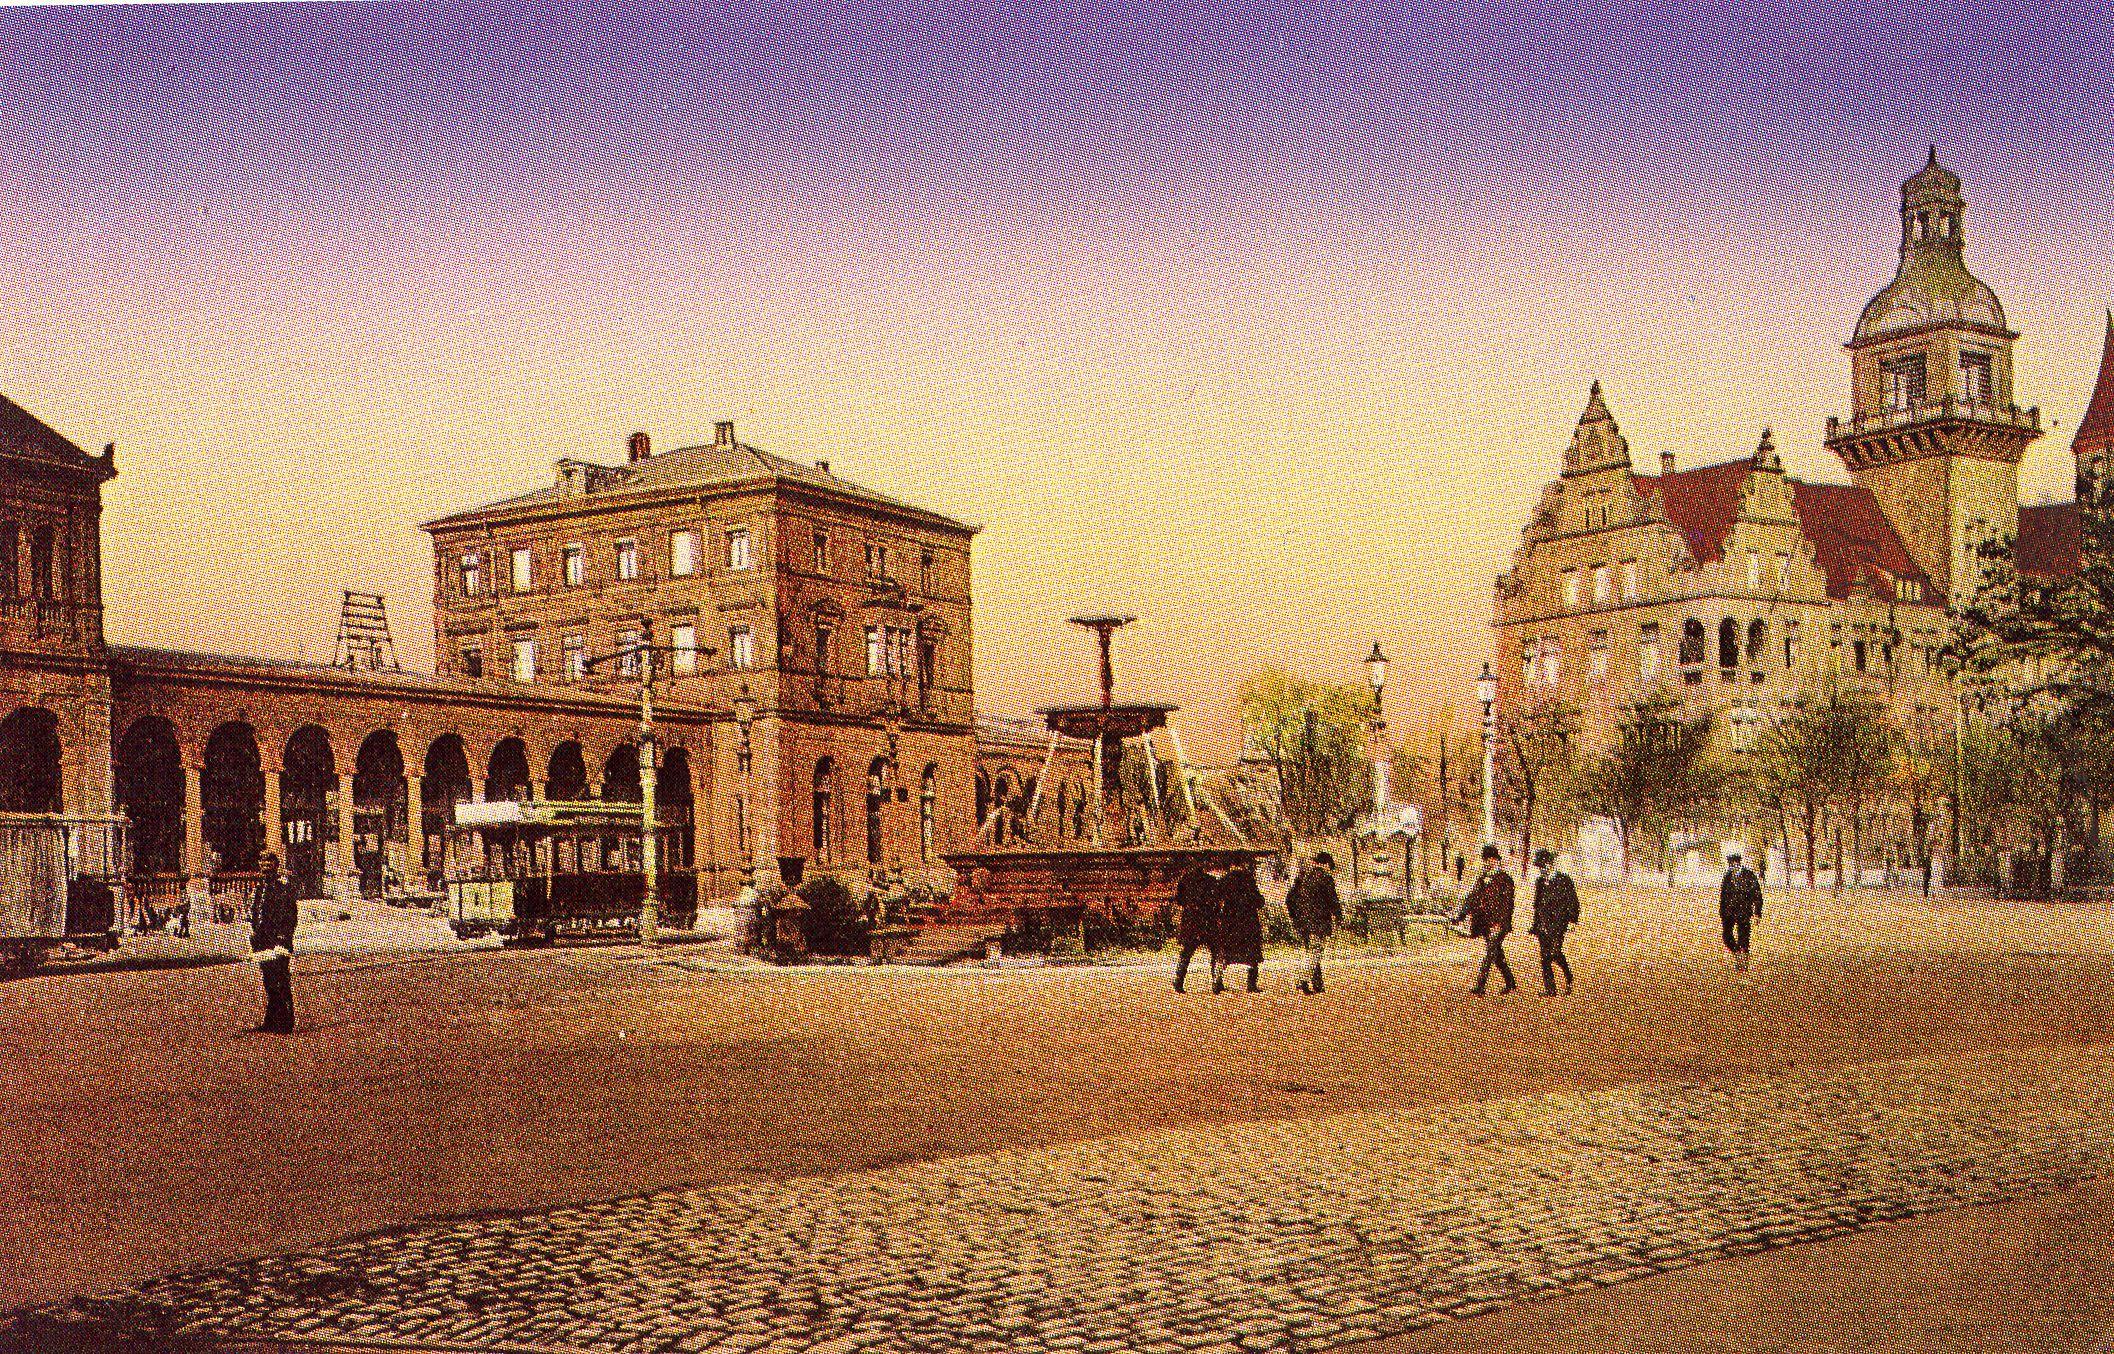 Historischer Schuss Hanix No 2 Www Hanix Magazin De Historische Bilder Bilder Heilbronn